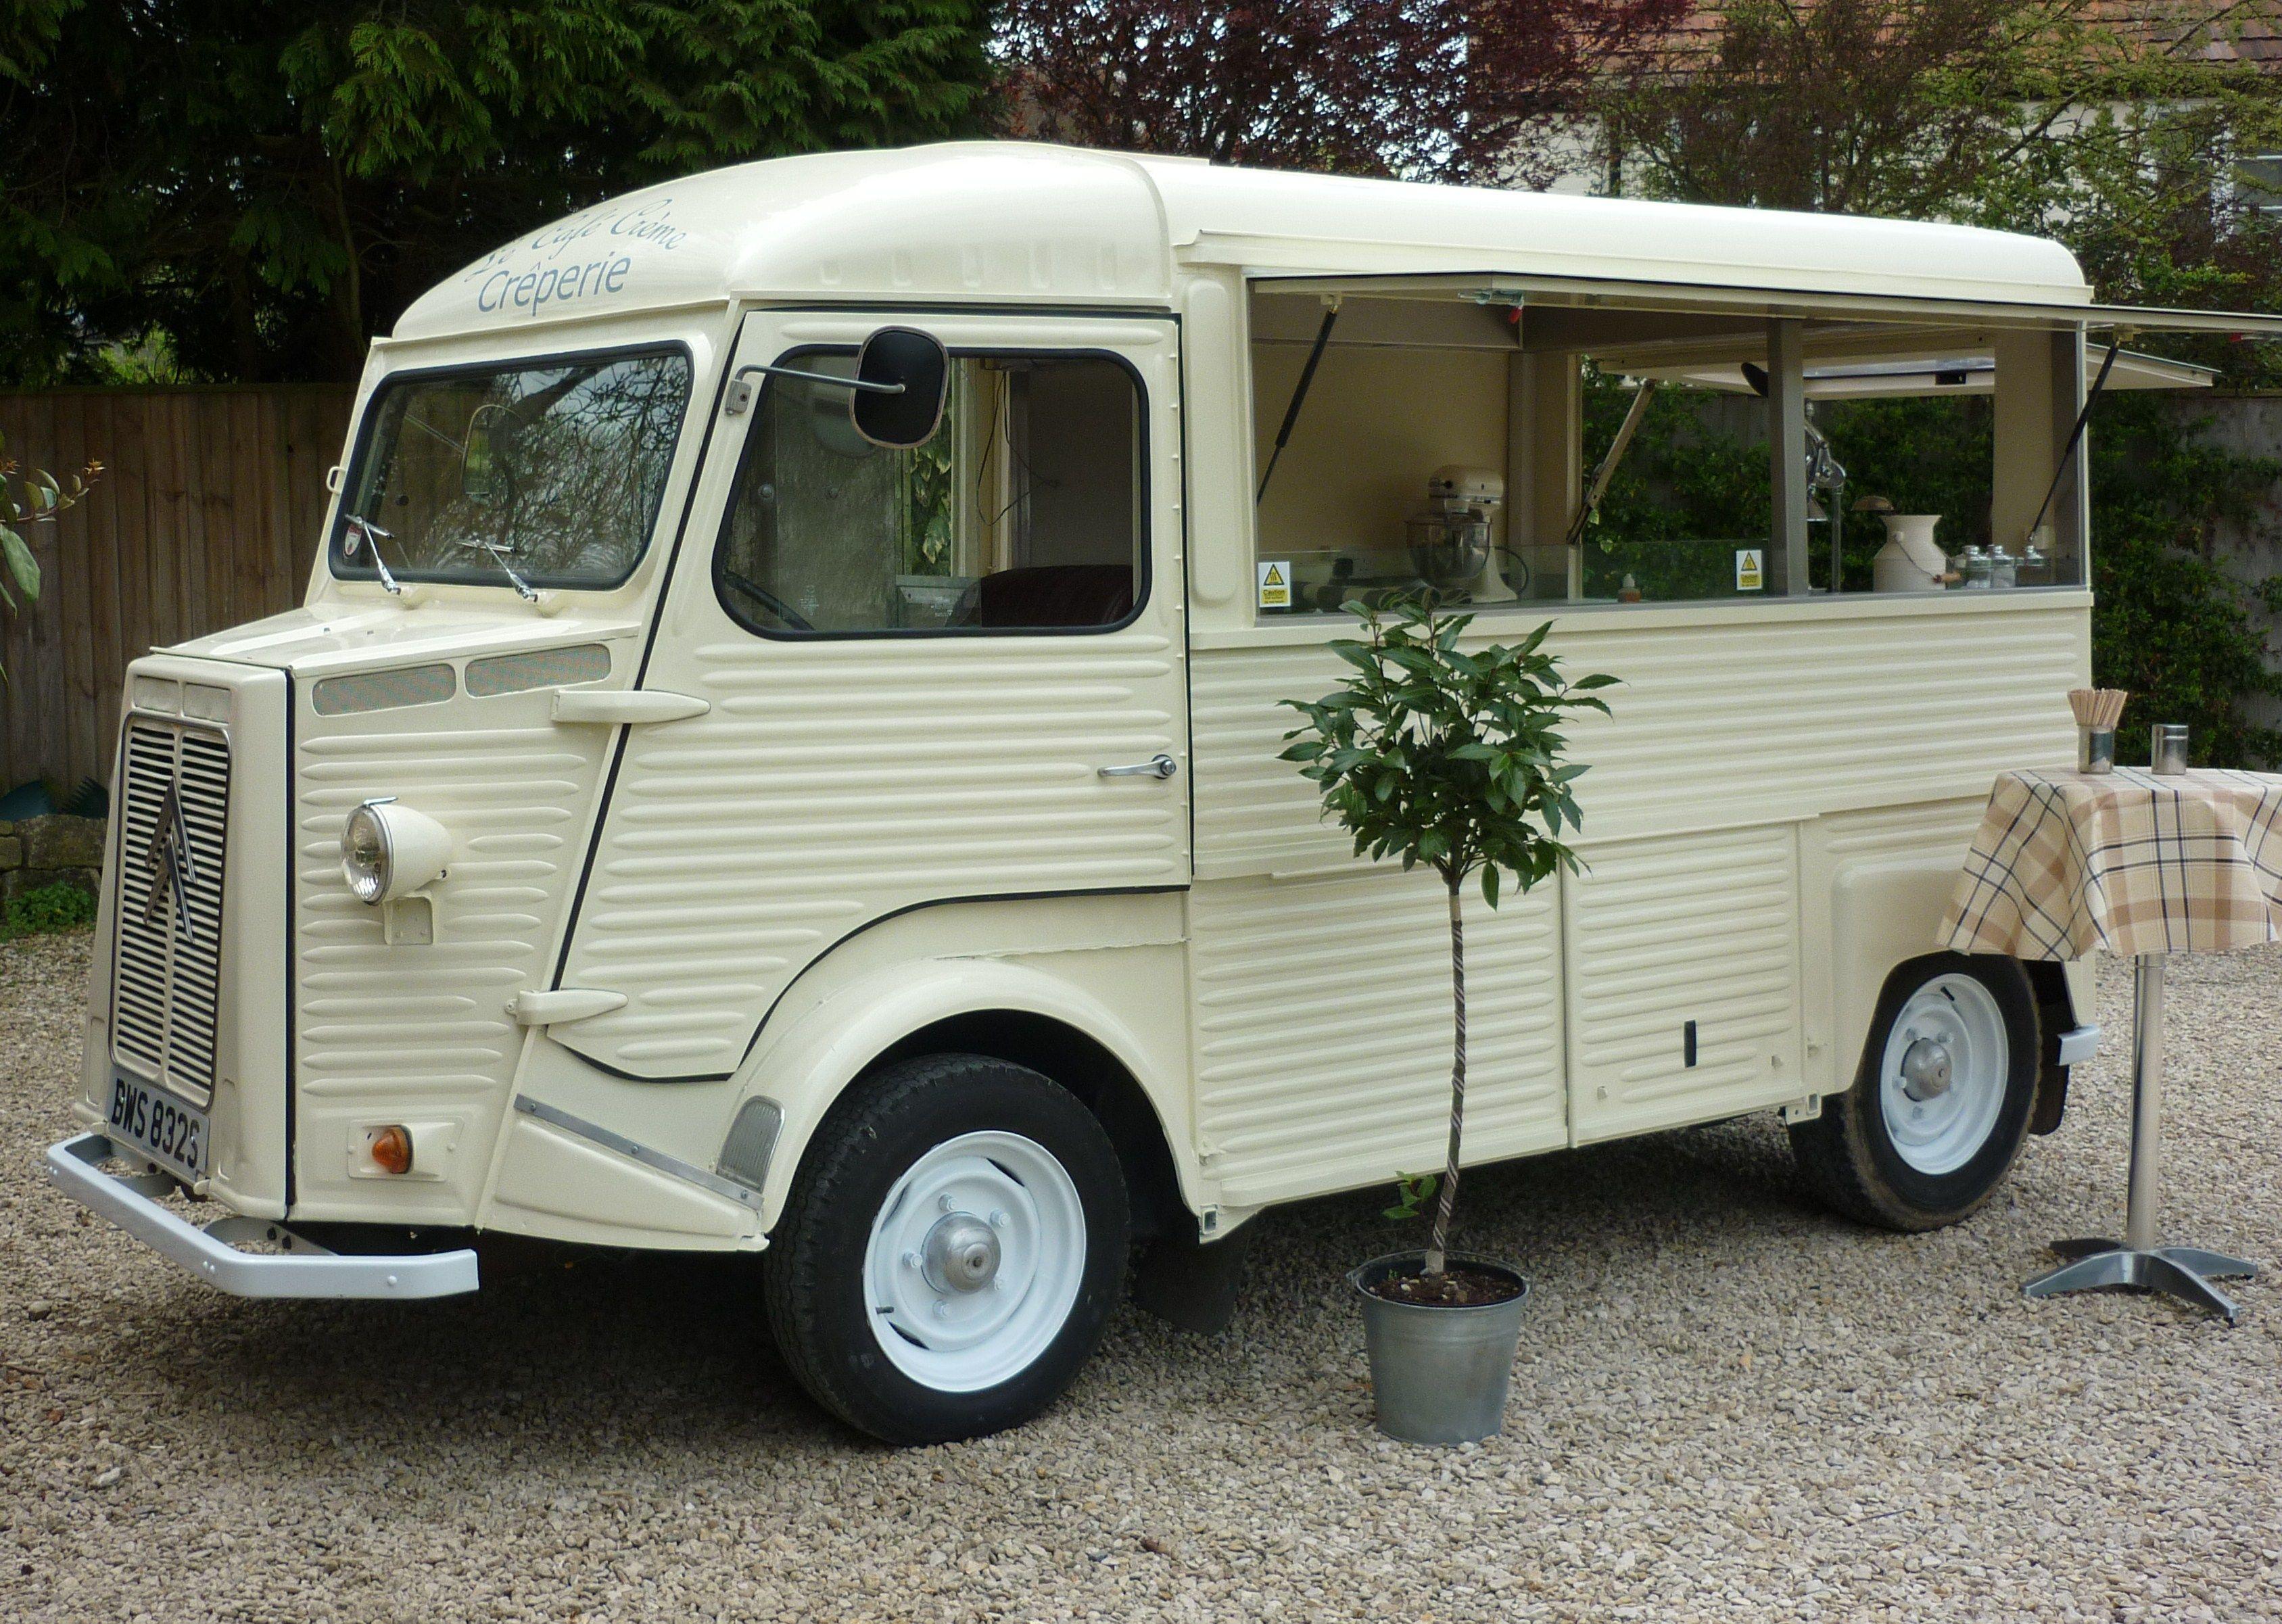 Le Cafe Creme: Wedding Food Gorgeousness | Food Truck | Cafe